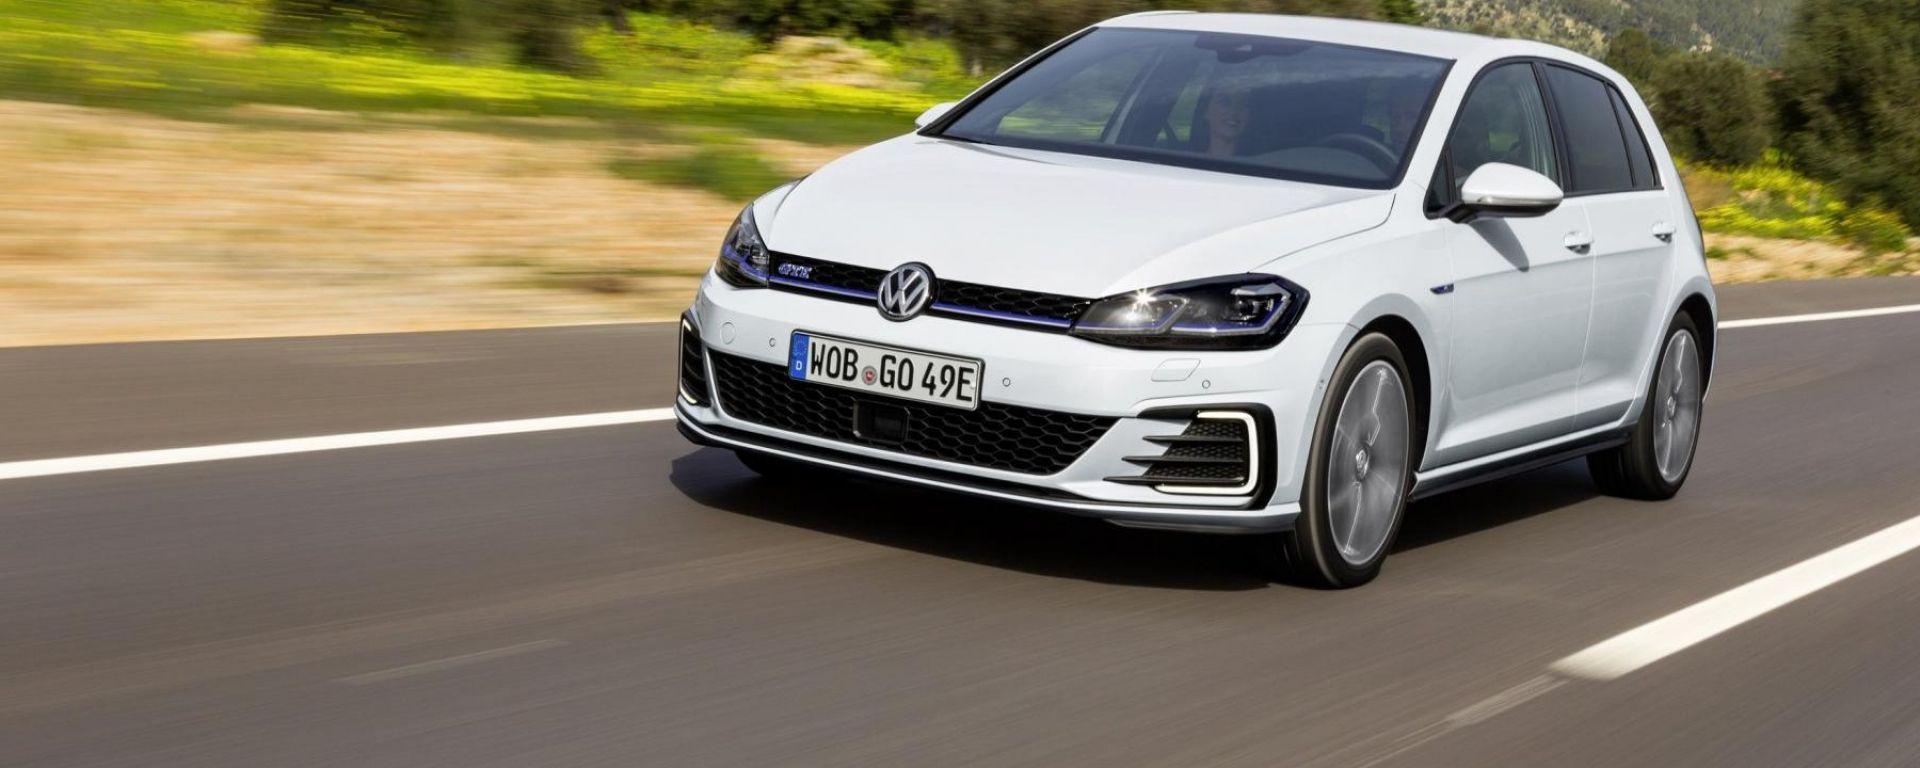 Volkswagen Golf, stop produttivo causa test emissioni WLTP